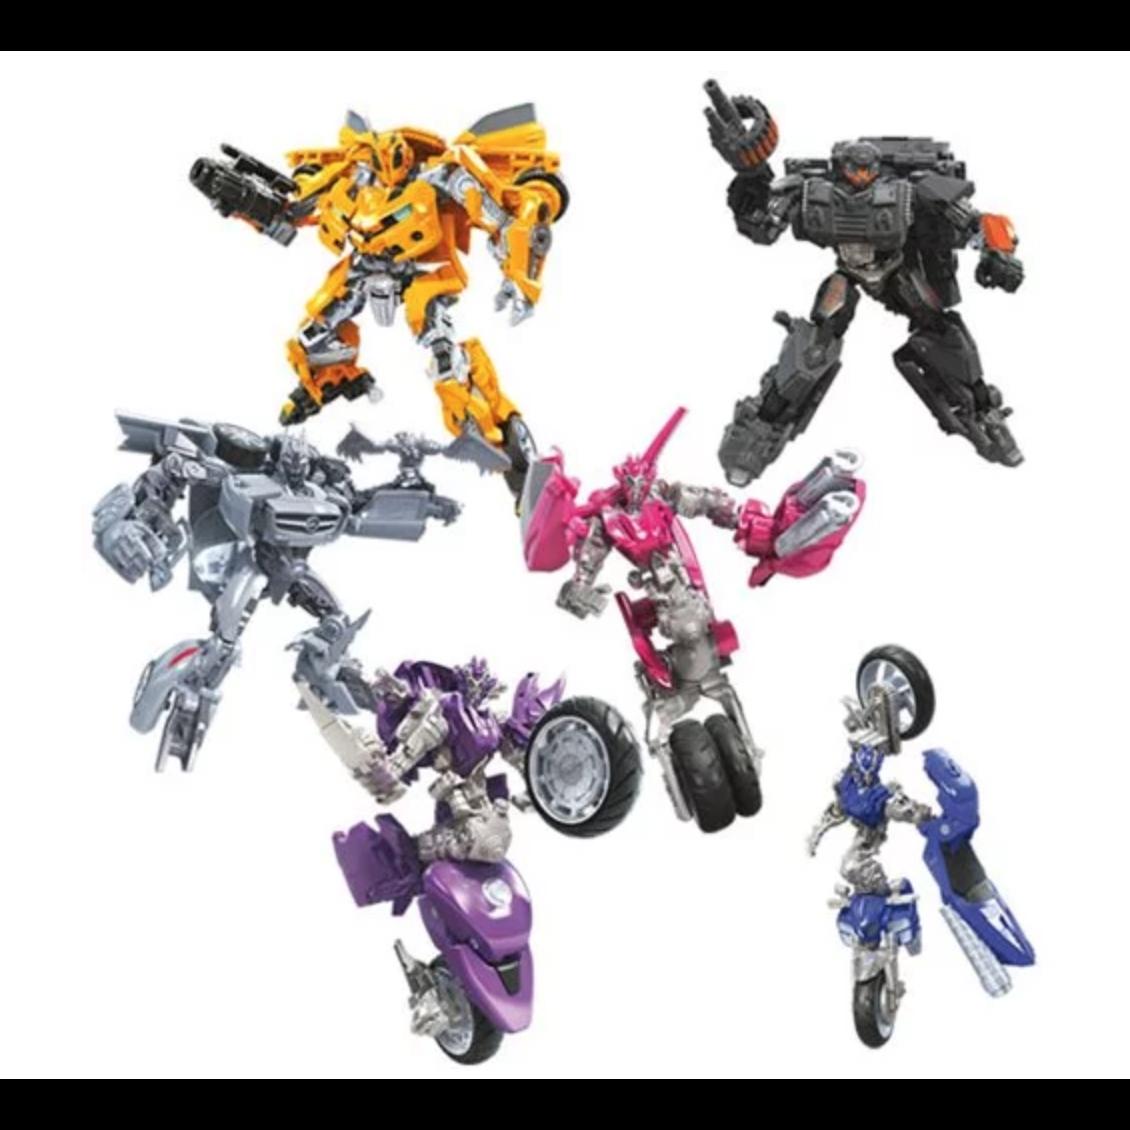 Image of Transformers Studio Series Premier Deluxe Wave 8 - Set of 4 (RE-STOCK)